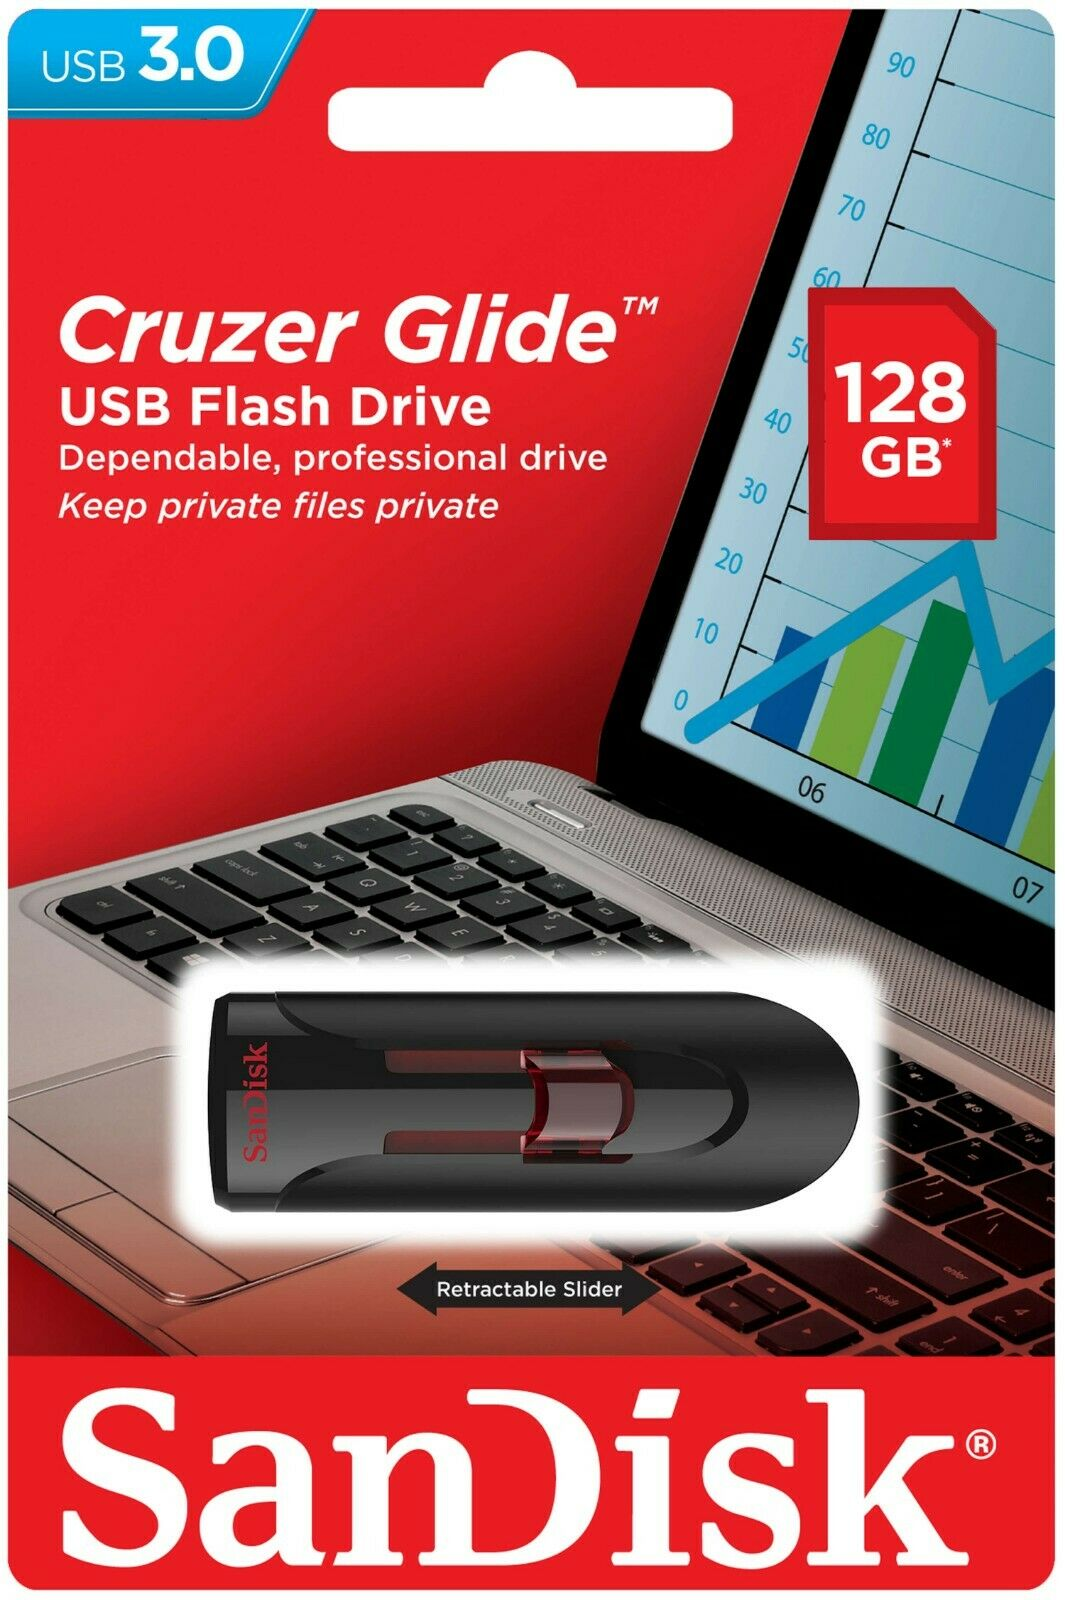 SanDisk Cruzer Glide USB 3.0 16GB 32GB 64GB 128GB Flash Driv